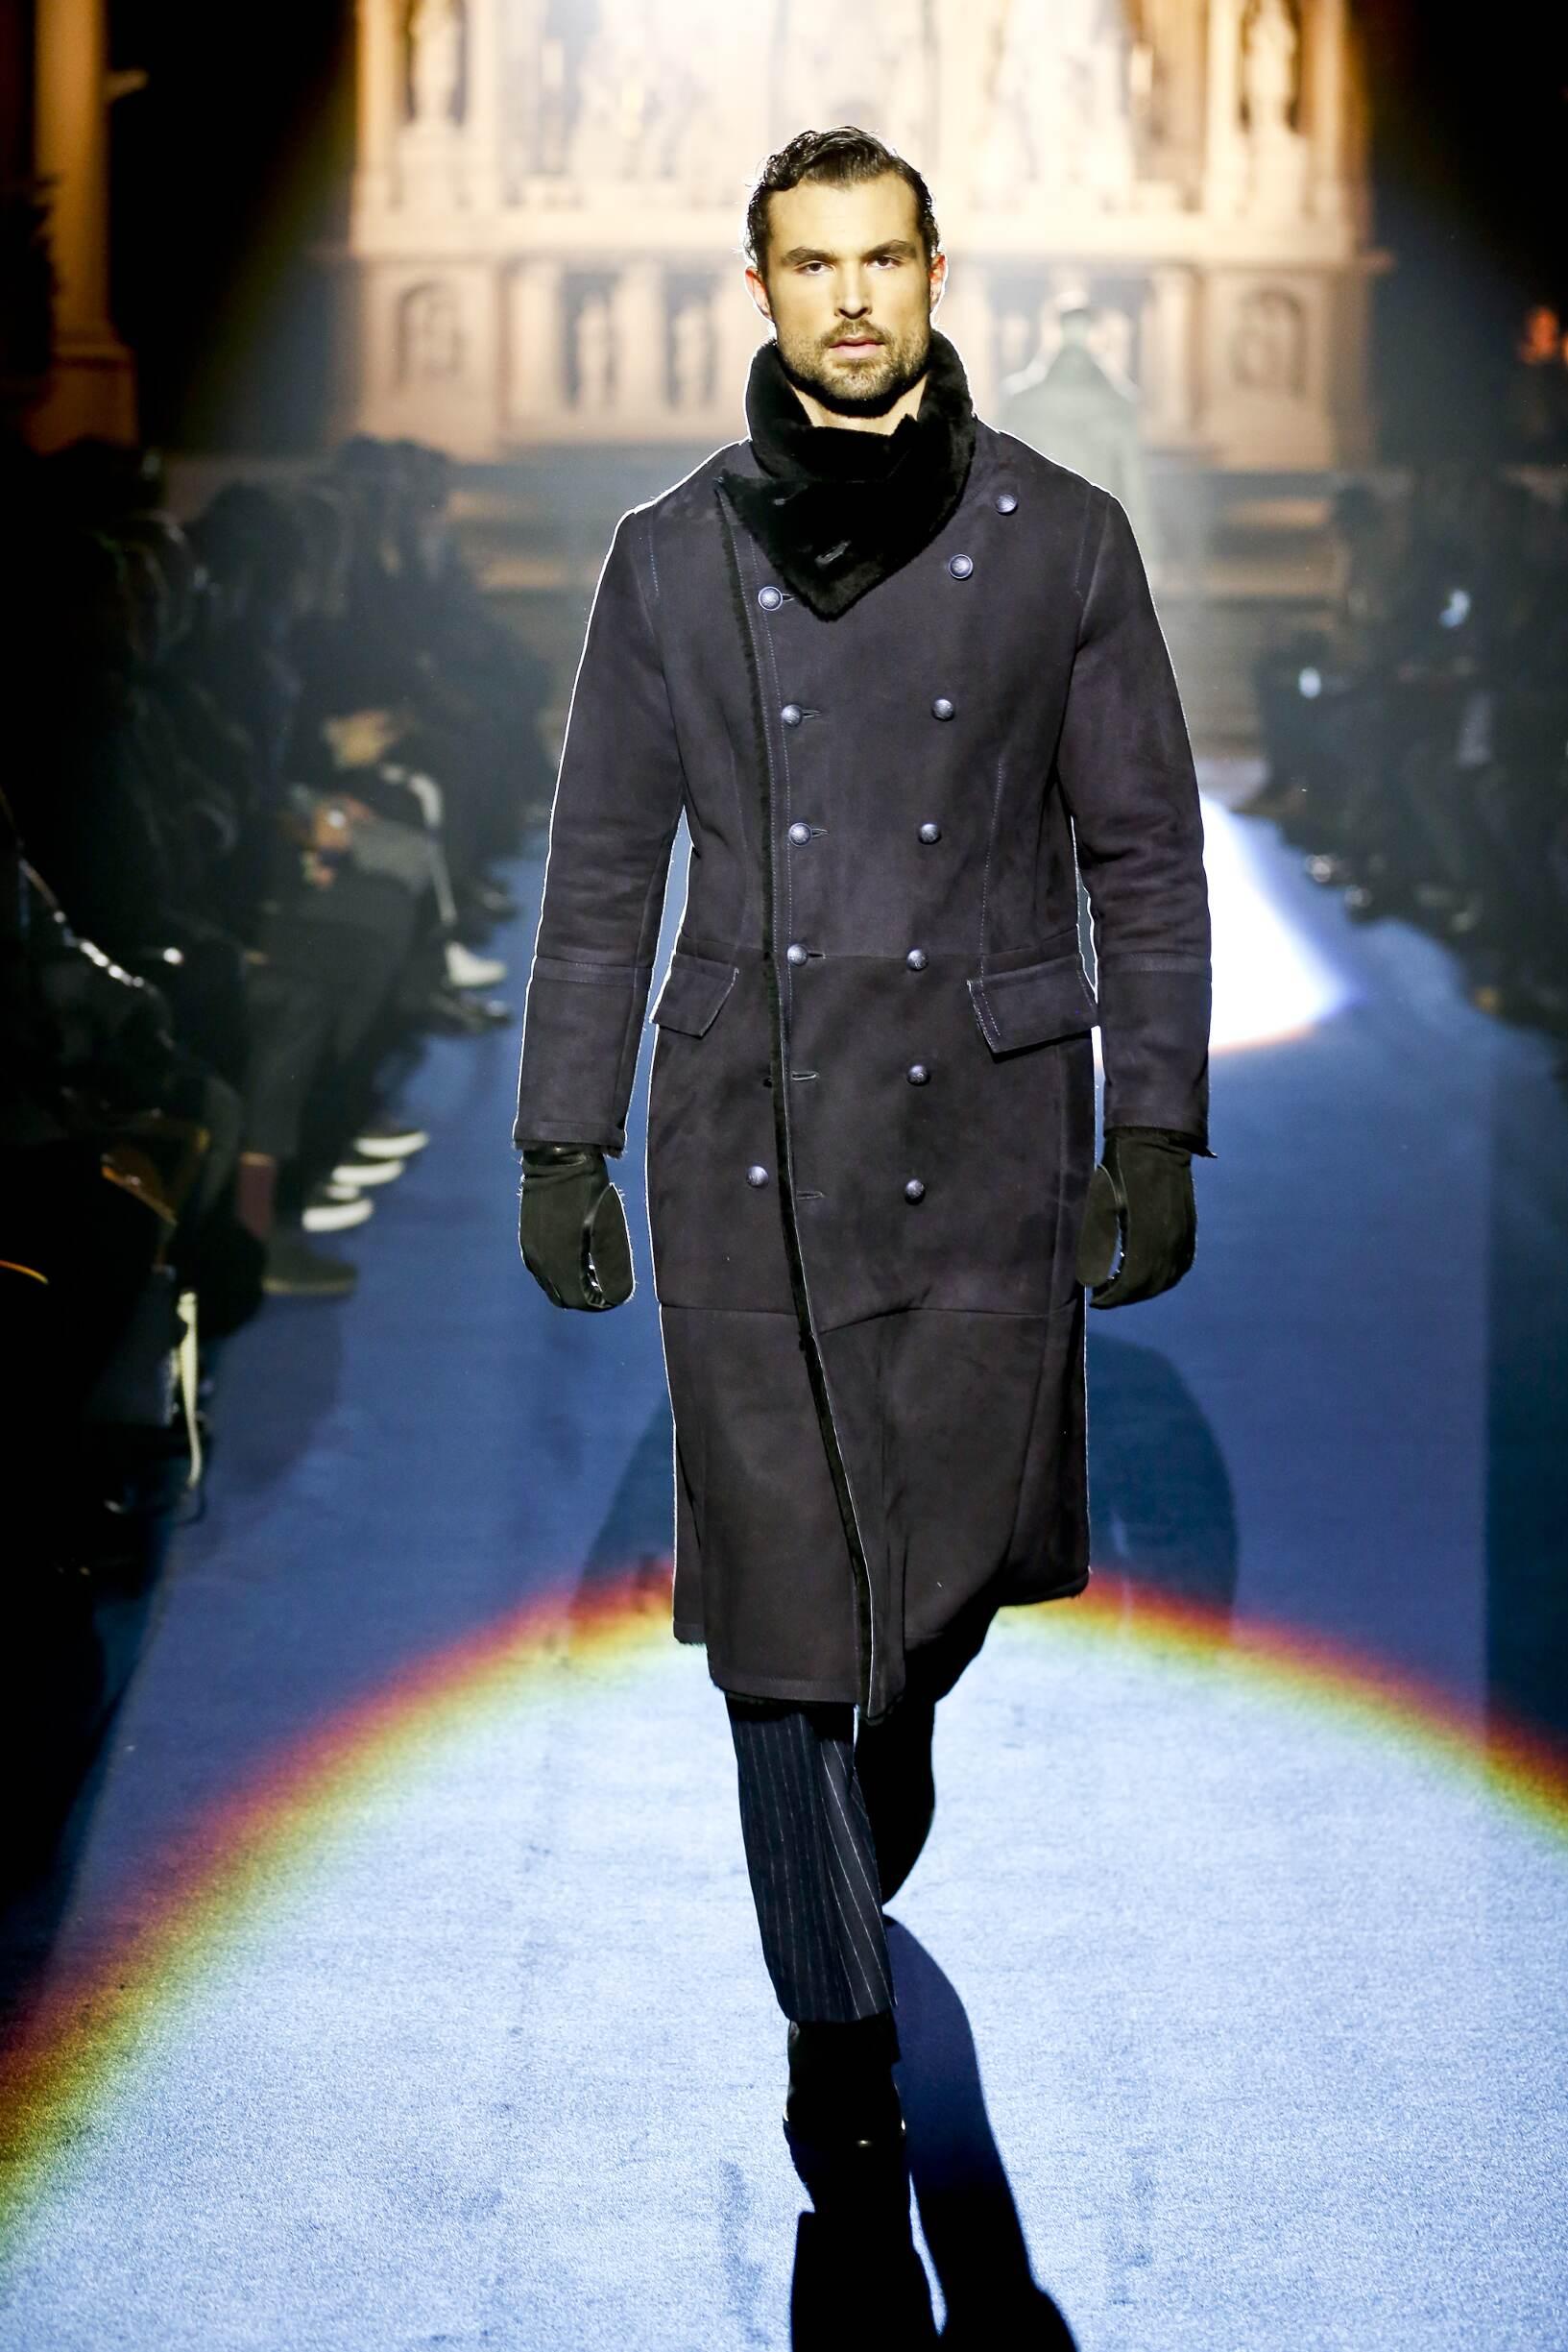 2017 Joseph Abboud Winter Catwalk